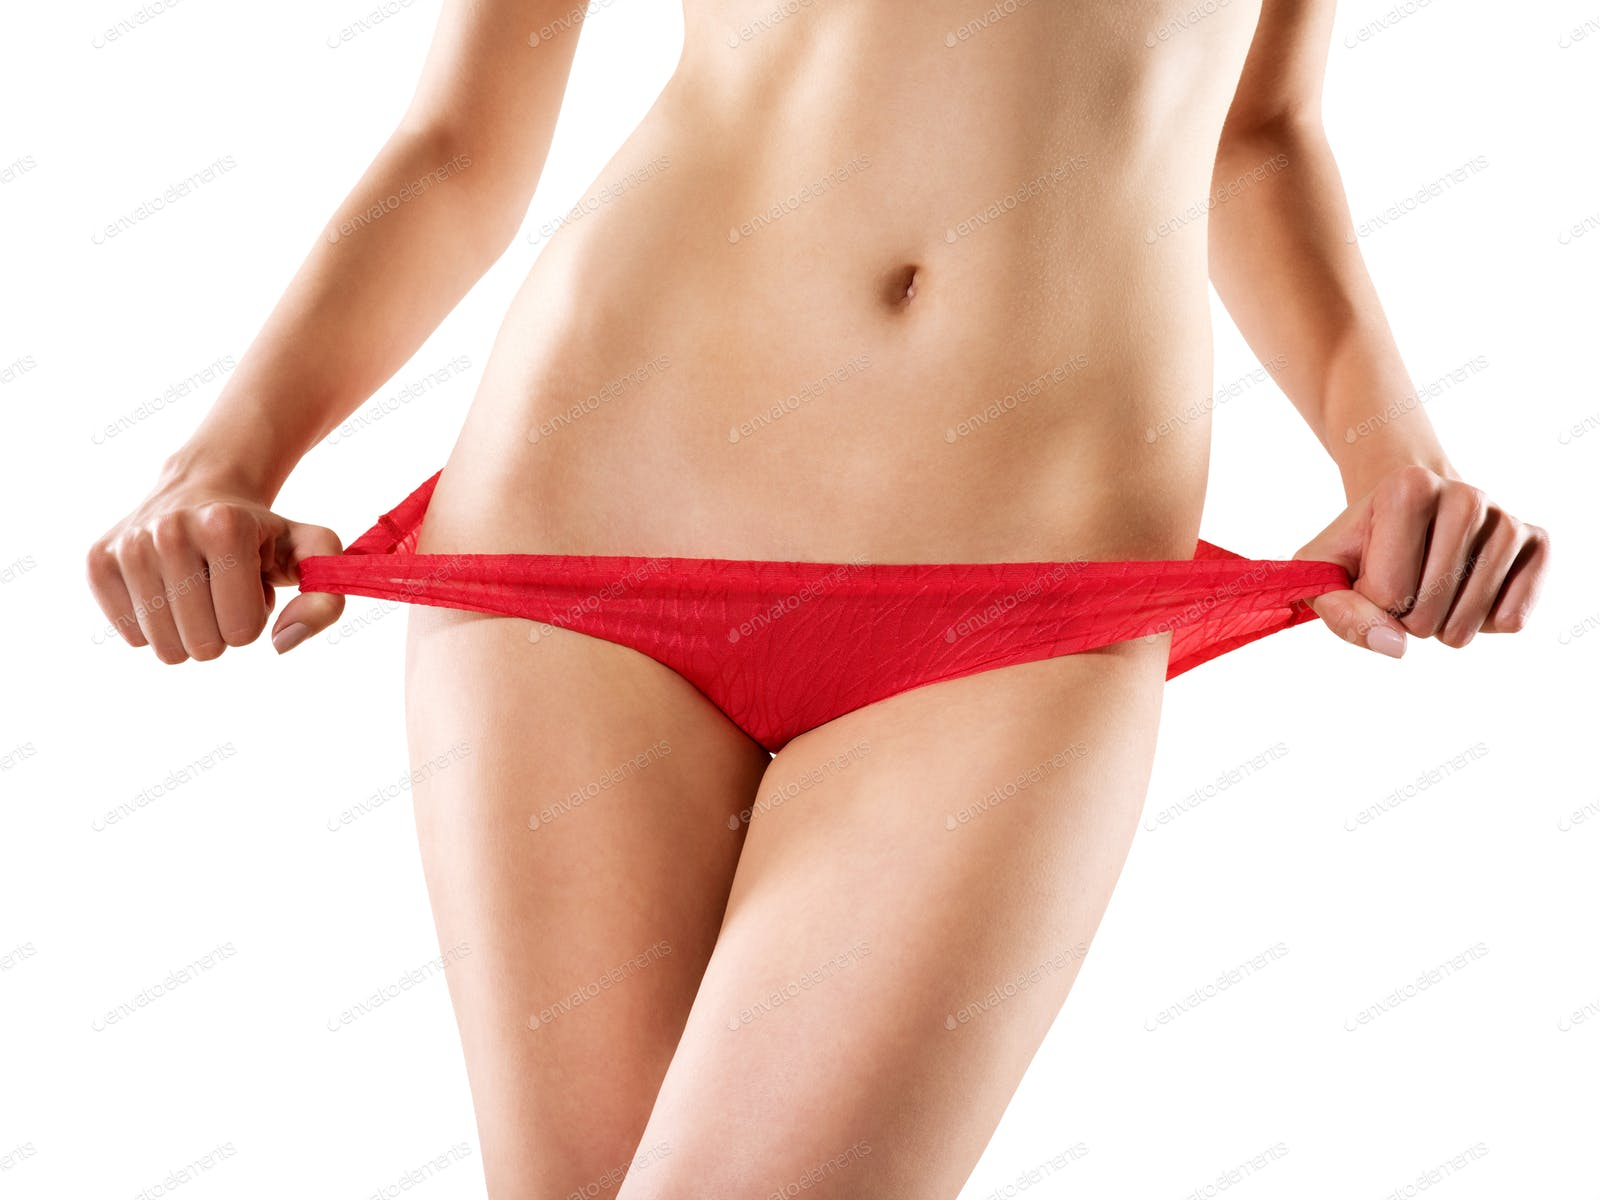 Girls In Panties Php Gif